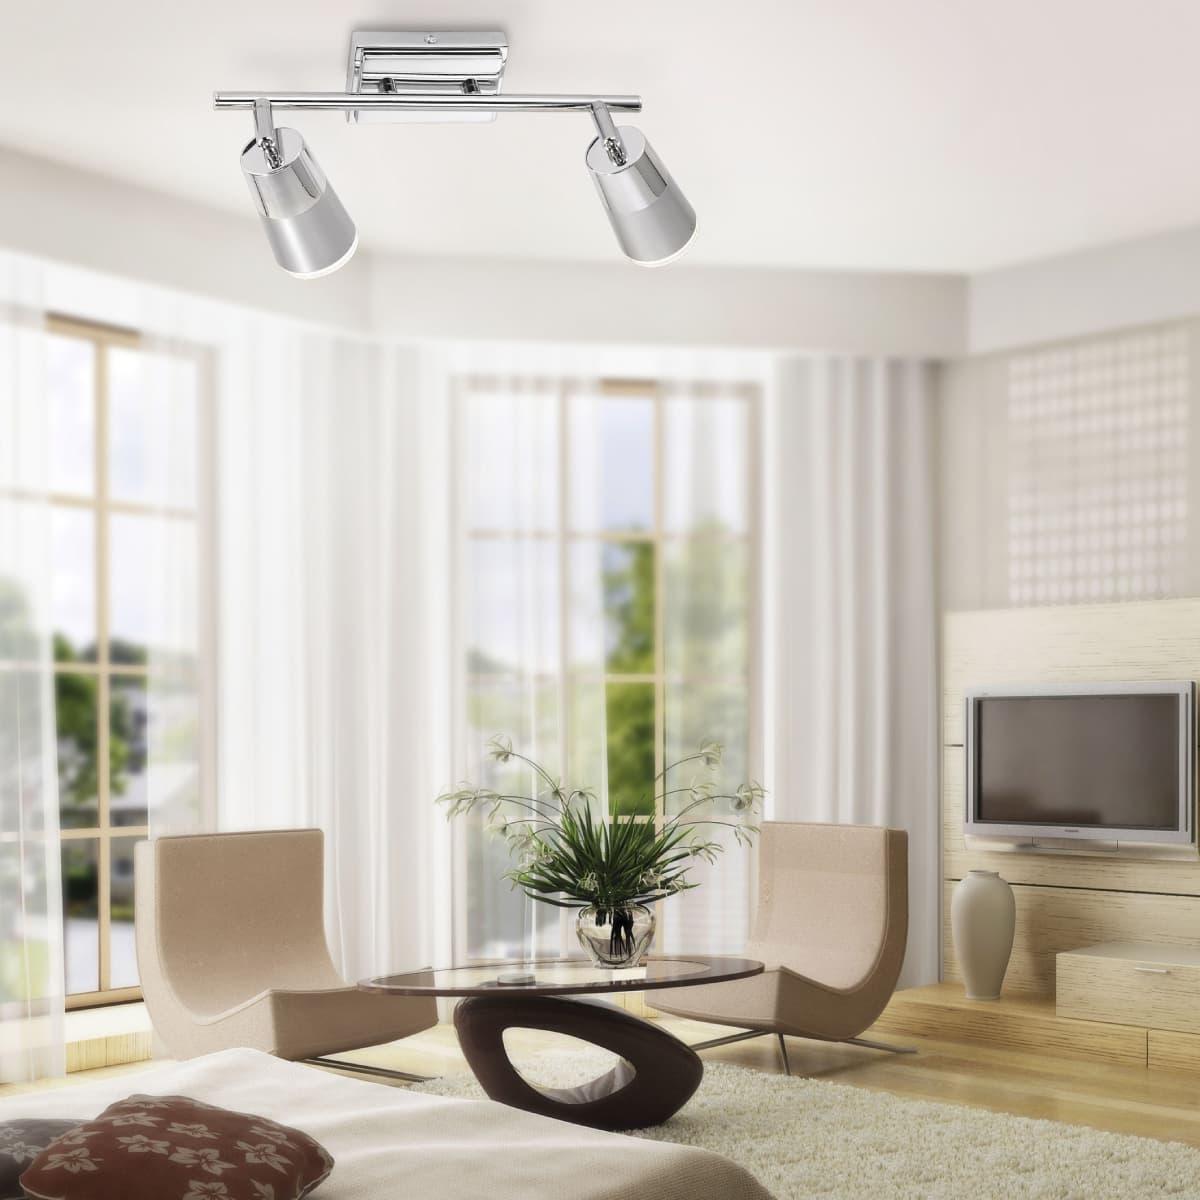 LED-Deckenleuchte, Chrom, 2 verstellbare Leuchtköpfe, inkl. Wippschalter